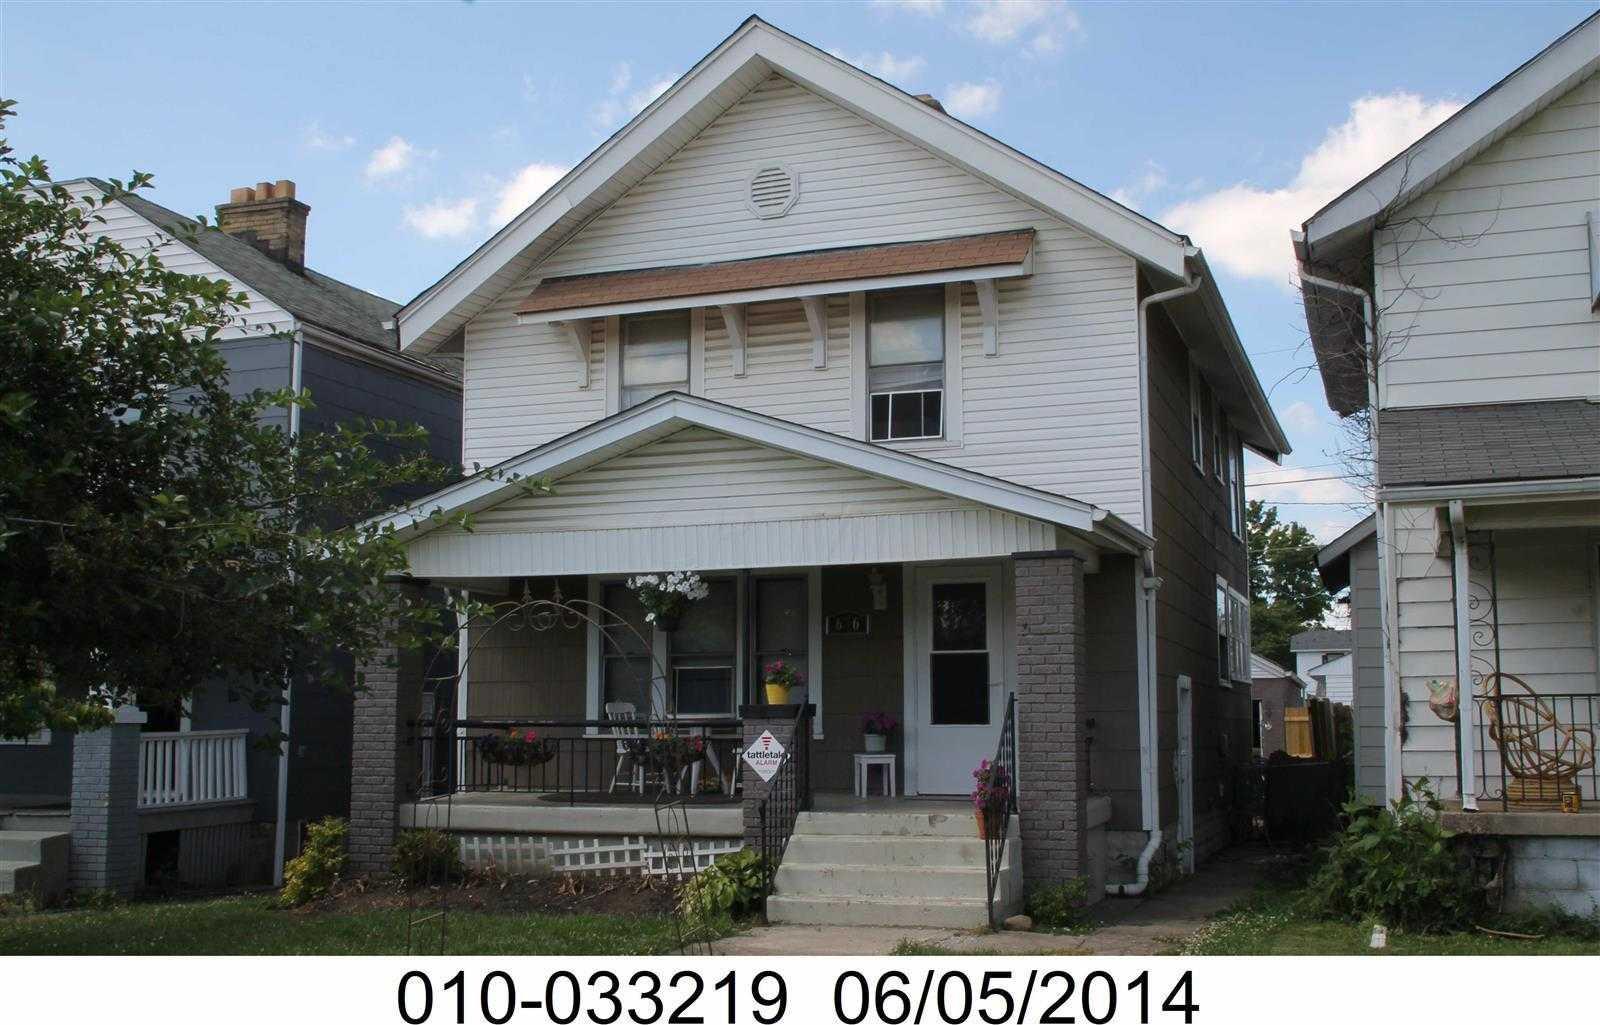 676 E Moler Street Columbus,OH 43207 215034058